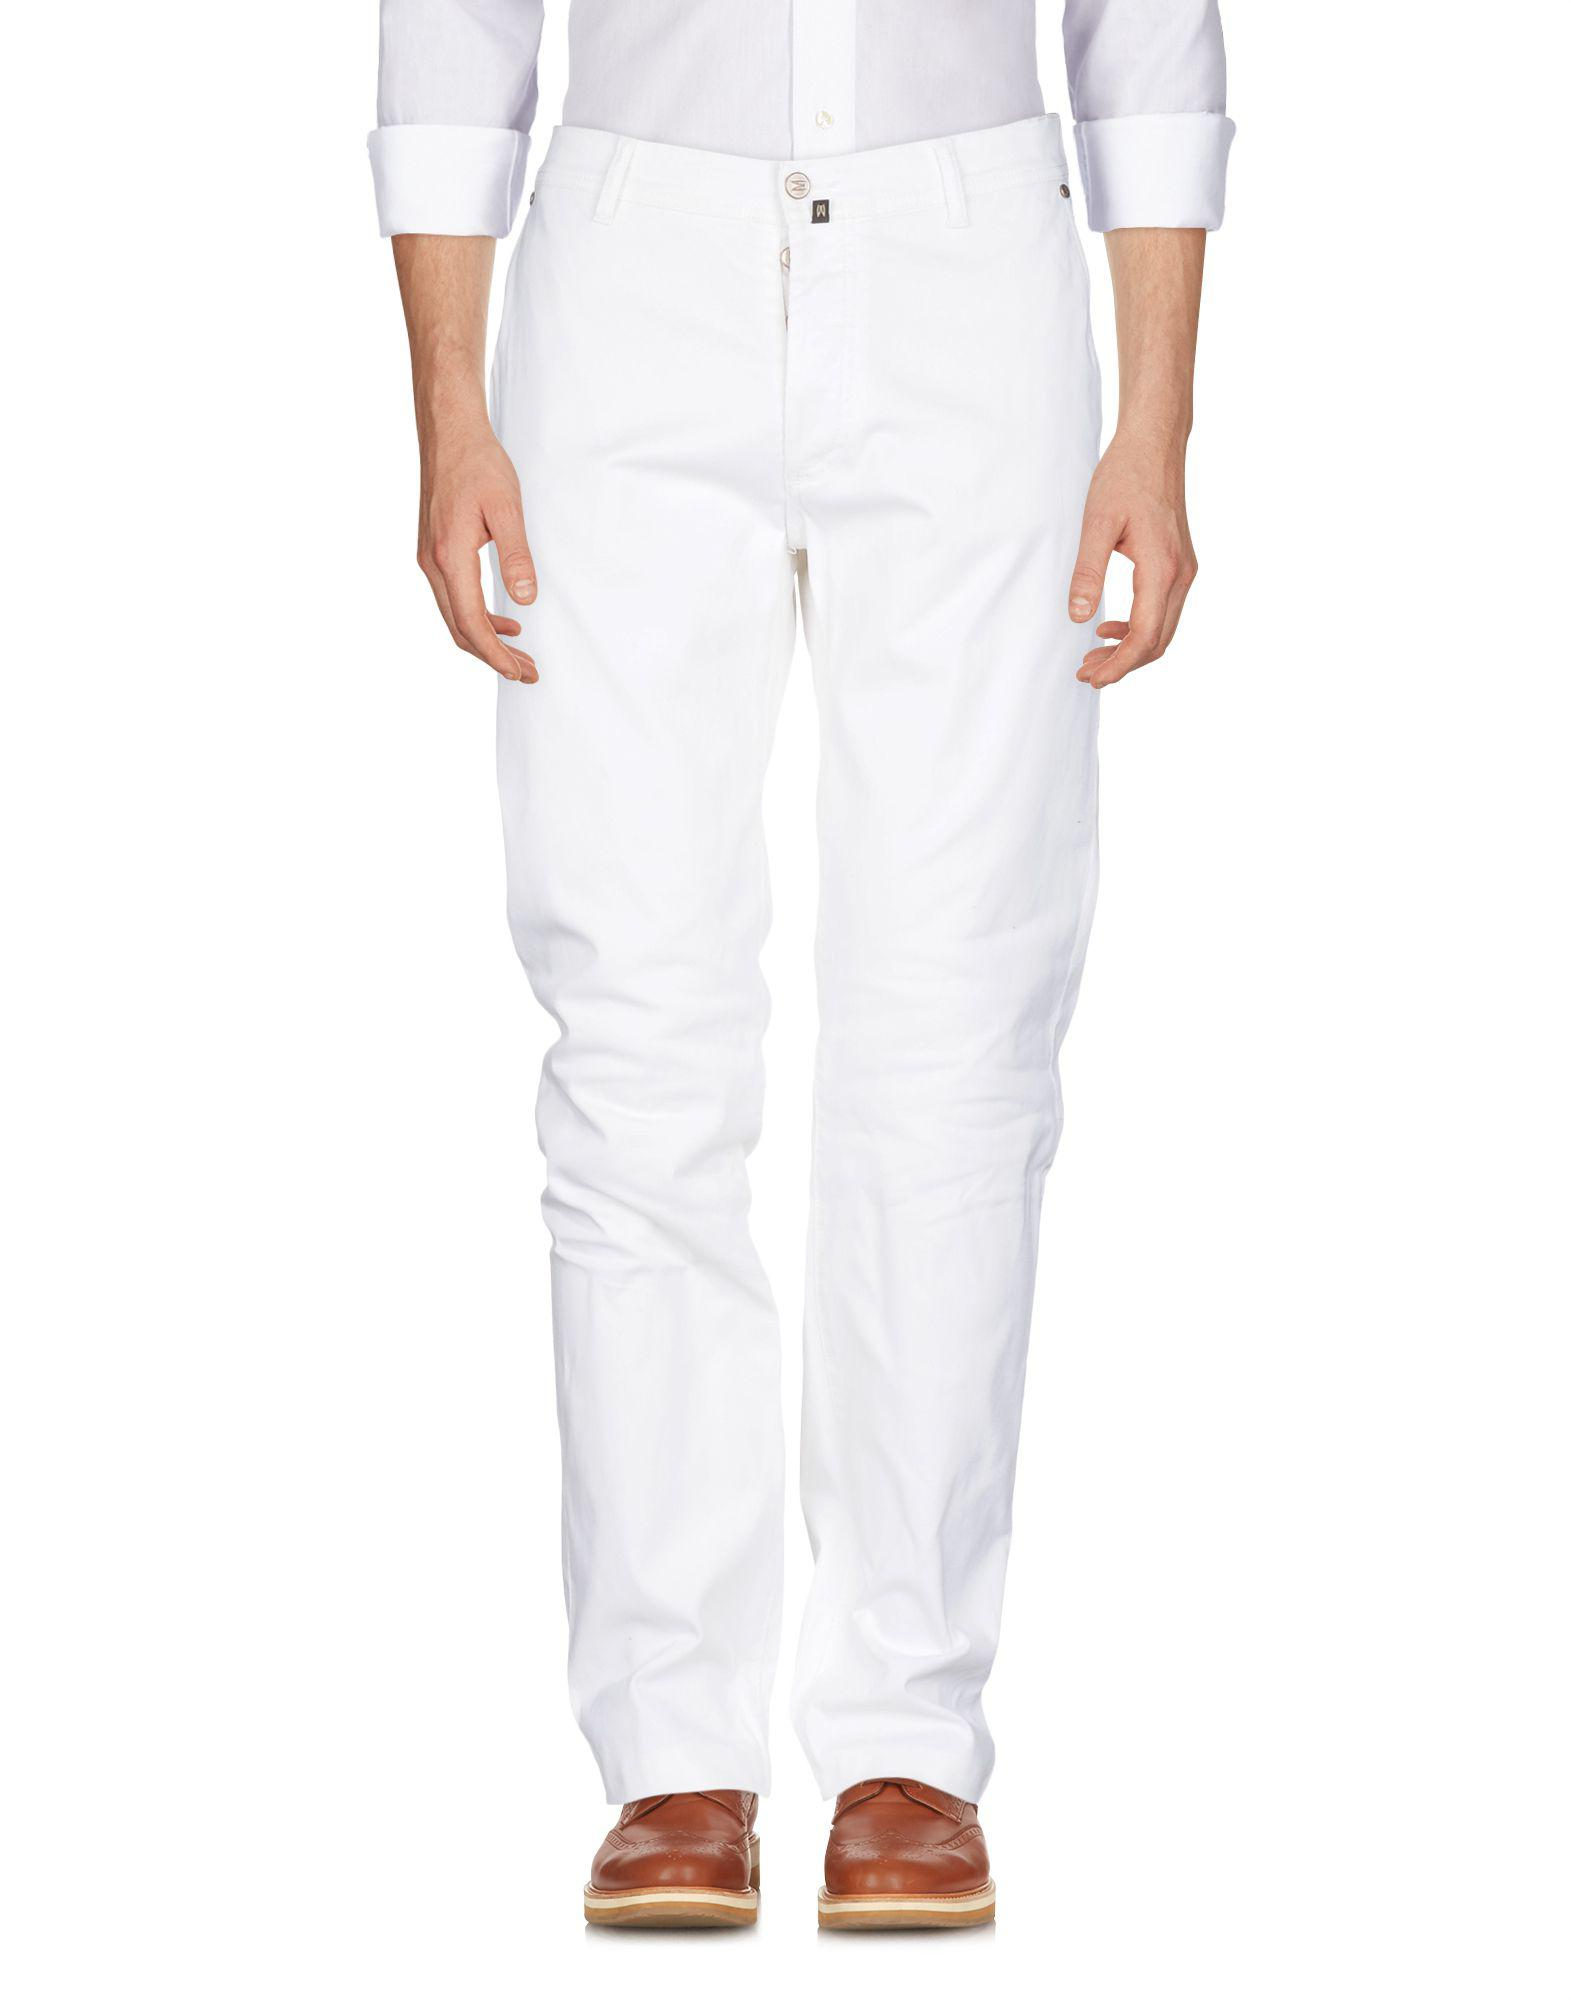 Pantalon - Pantalon Décontracté Marco Pescarolo 8Xz5zrd